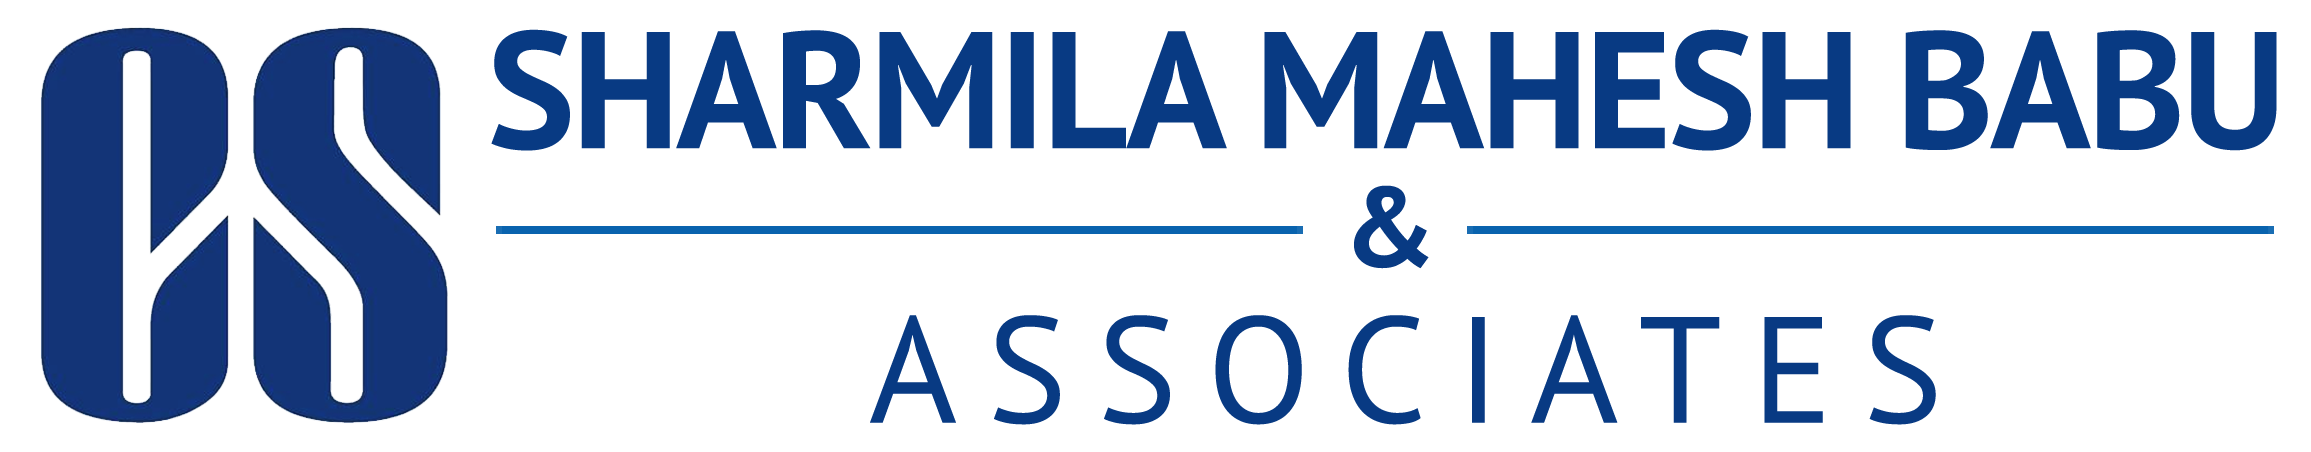 M/s Sharmila Mahesh Babu & Associates (SMBA)